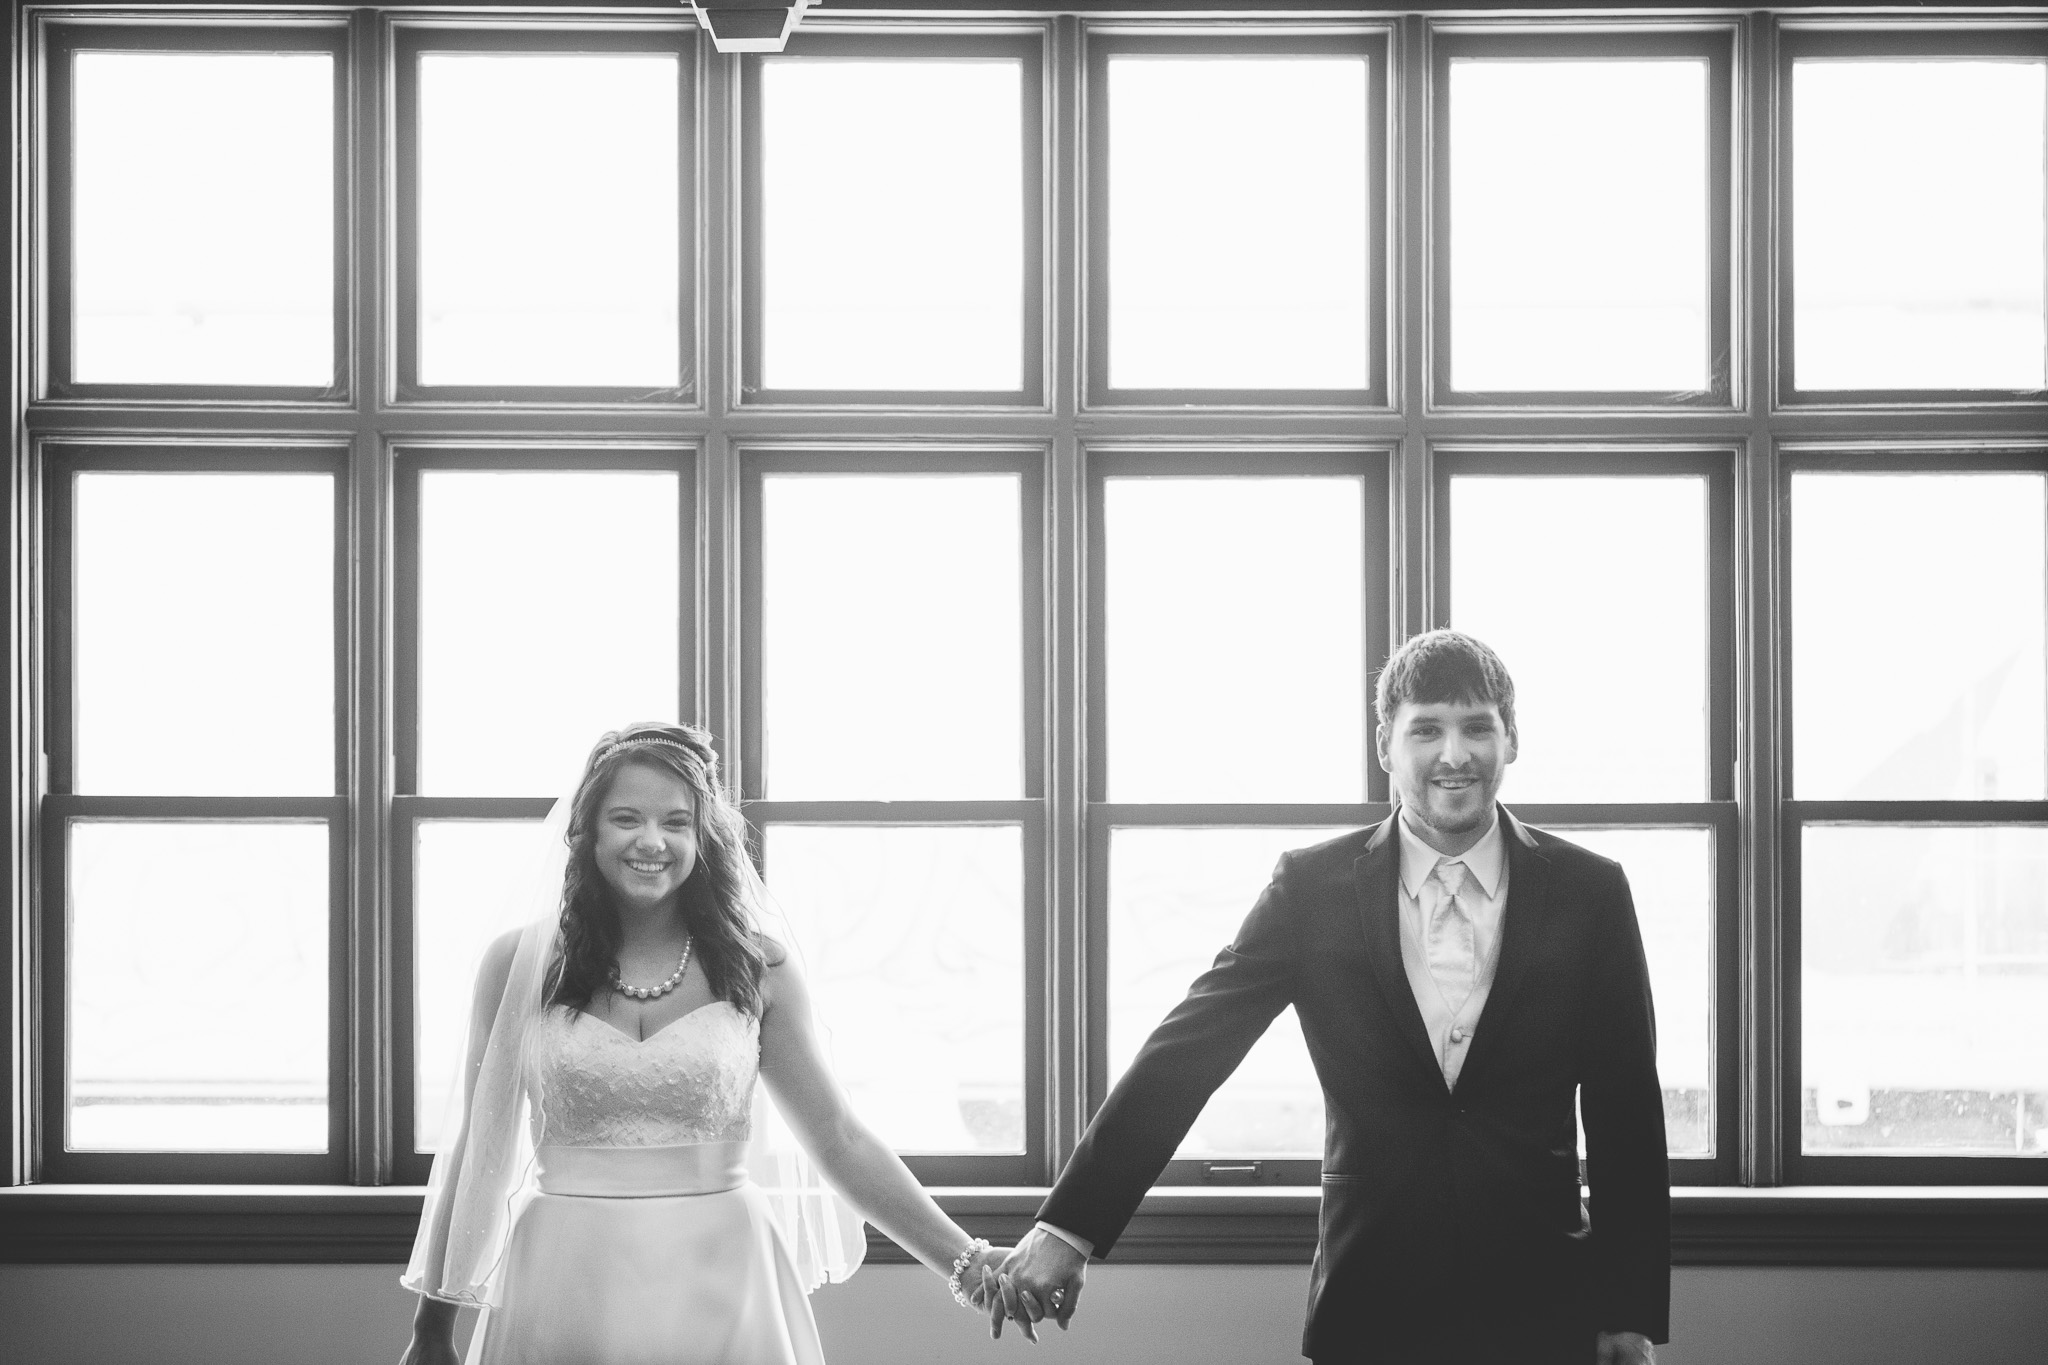 082-Jonathan-Kuhn-Photography-Victoria-Brandon-Wedding-WEB-1234.jpg